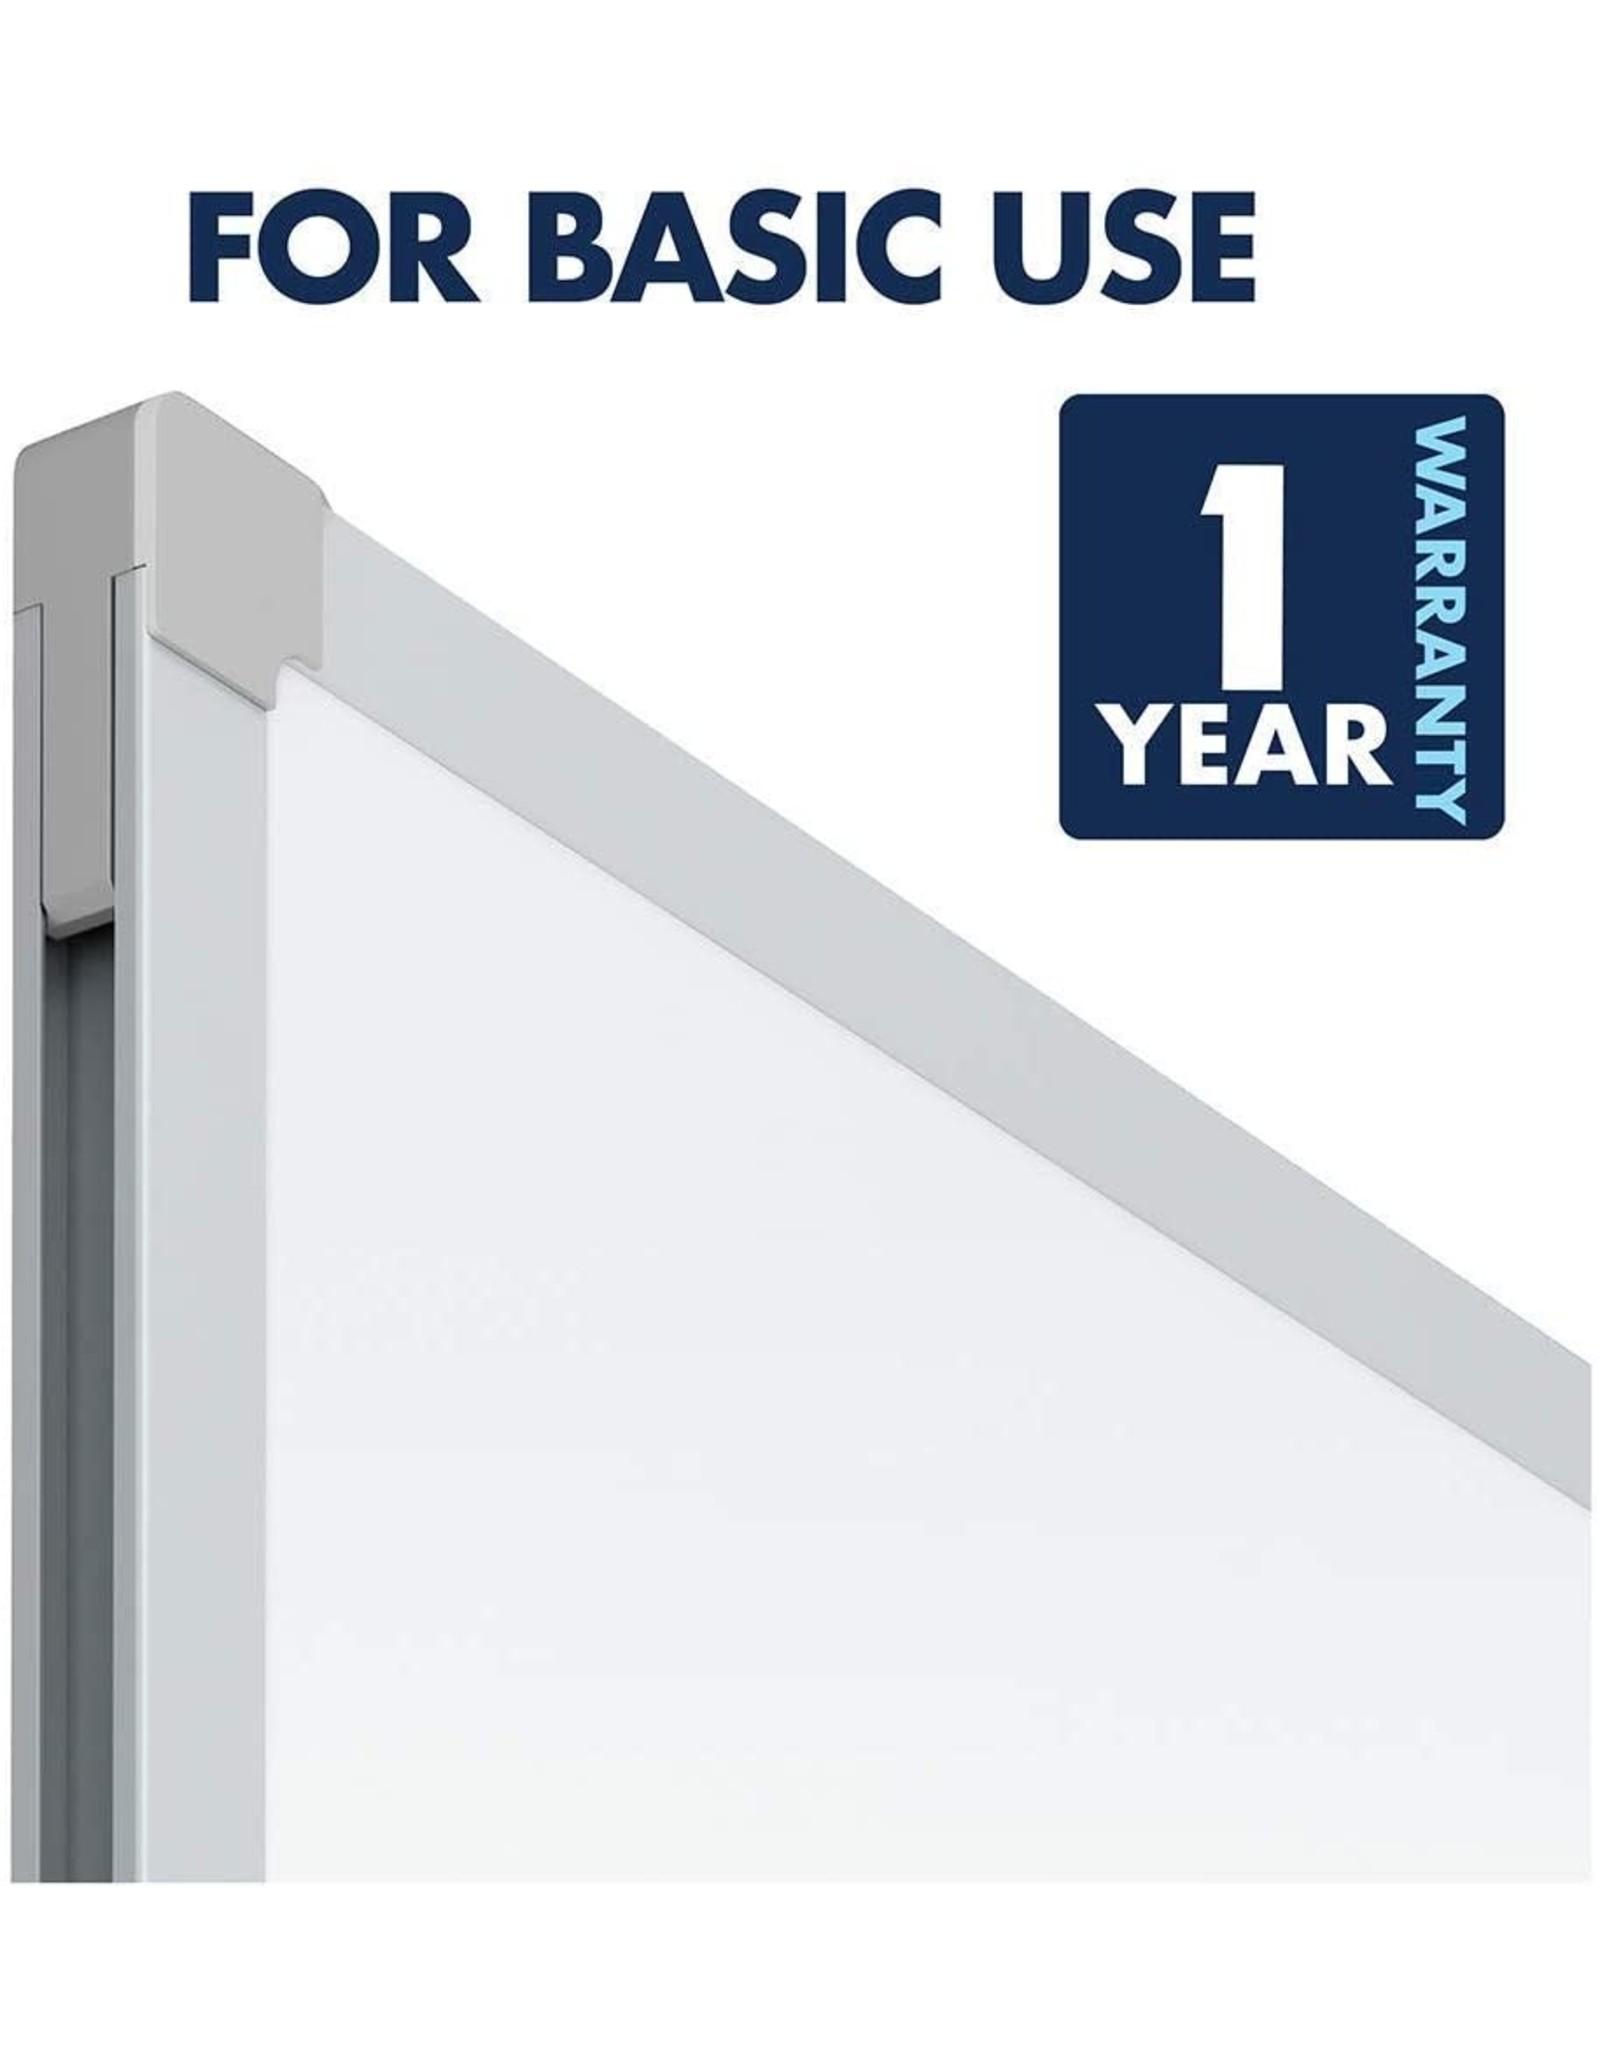 Mead Mead Dry Erase Board, Whiteboard / White Board, 24 x 18 Inches, Silver Finish Aluminum Frame (85355)